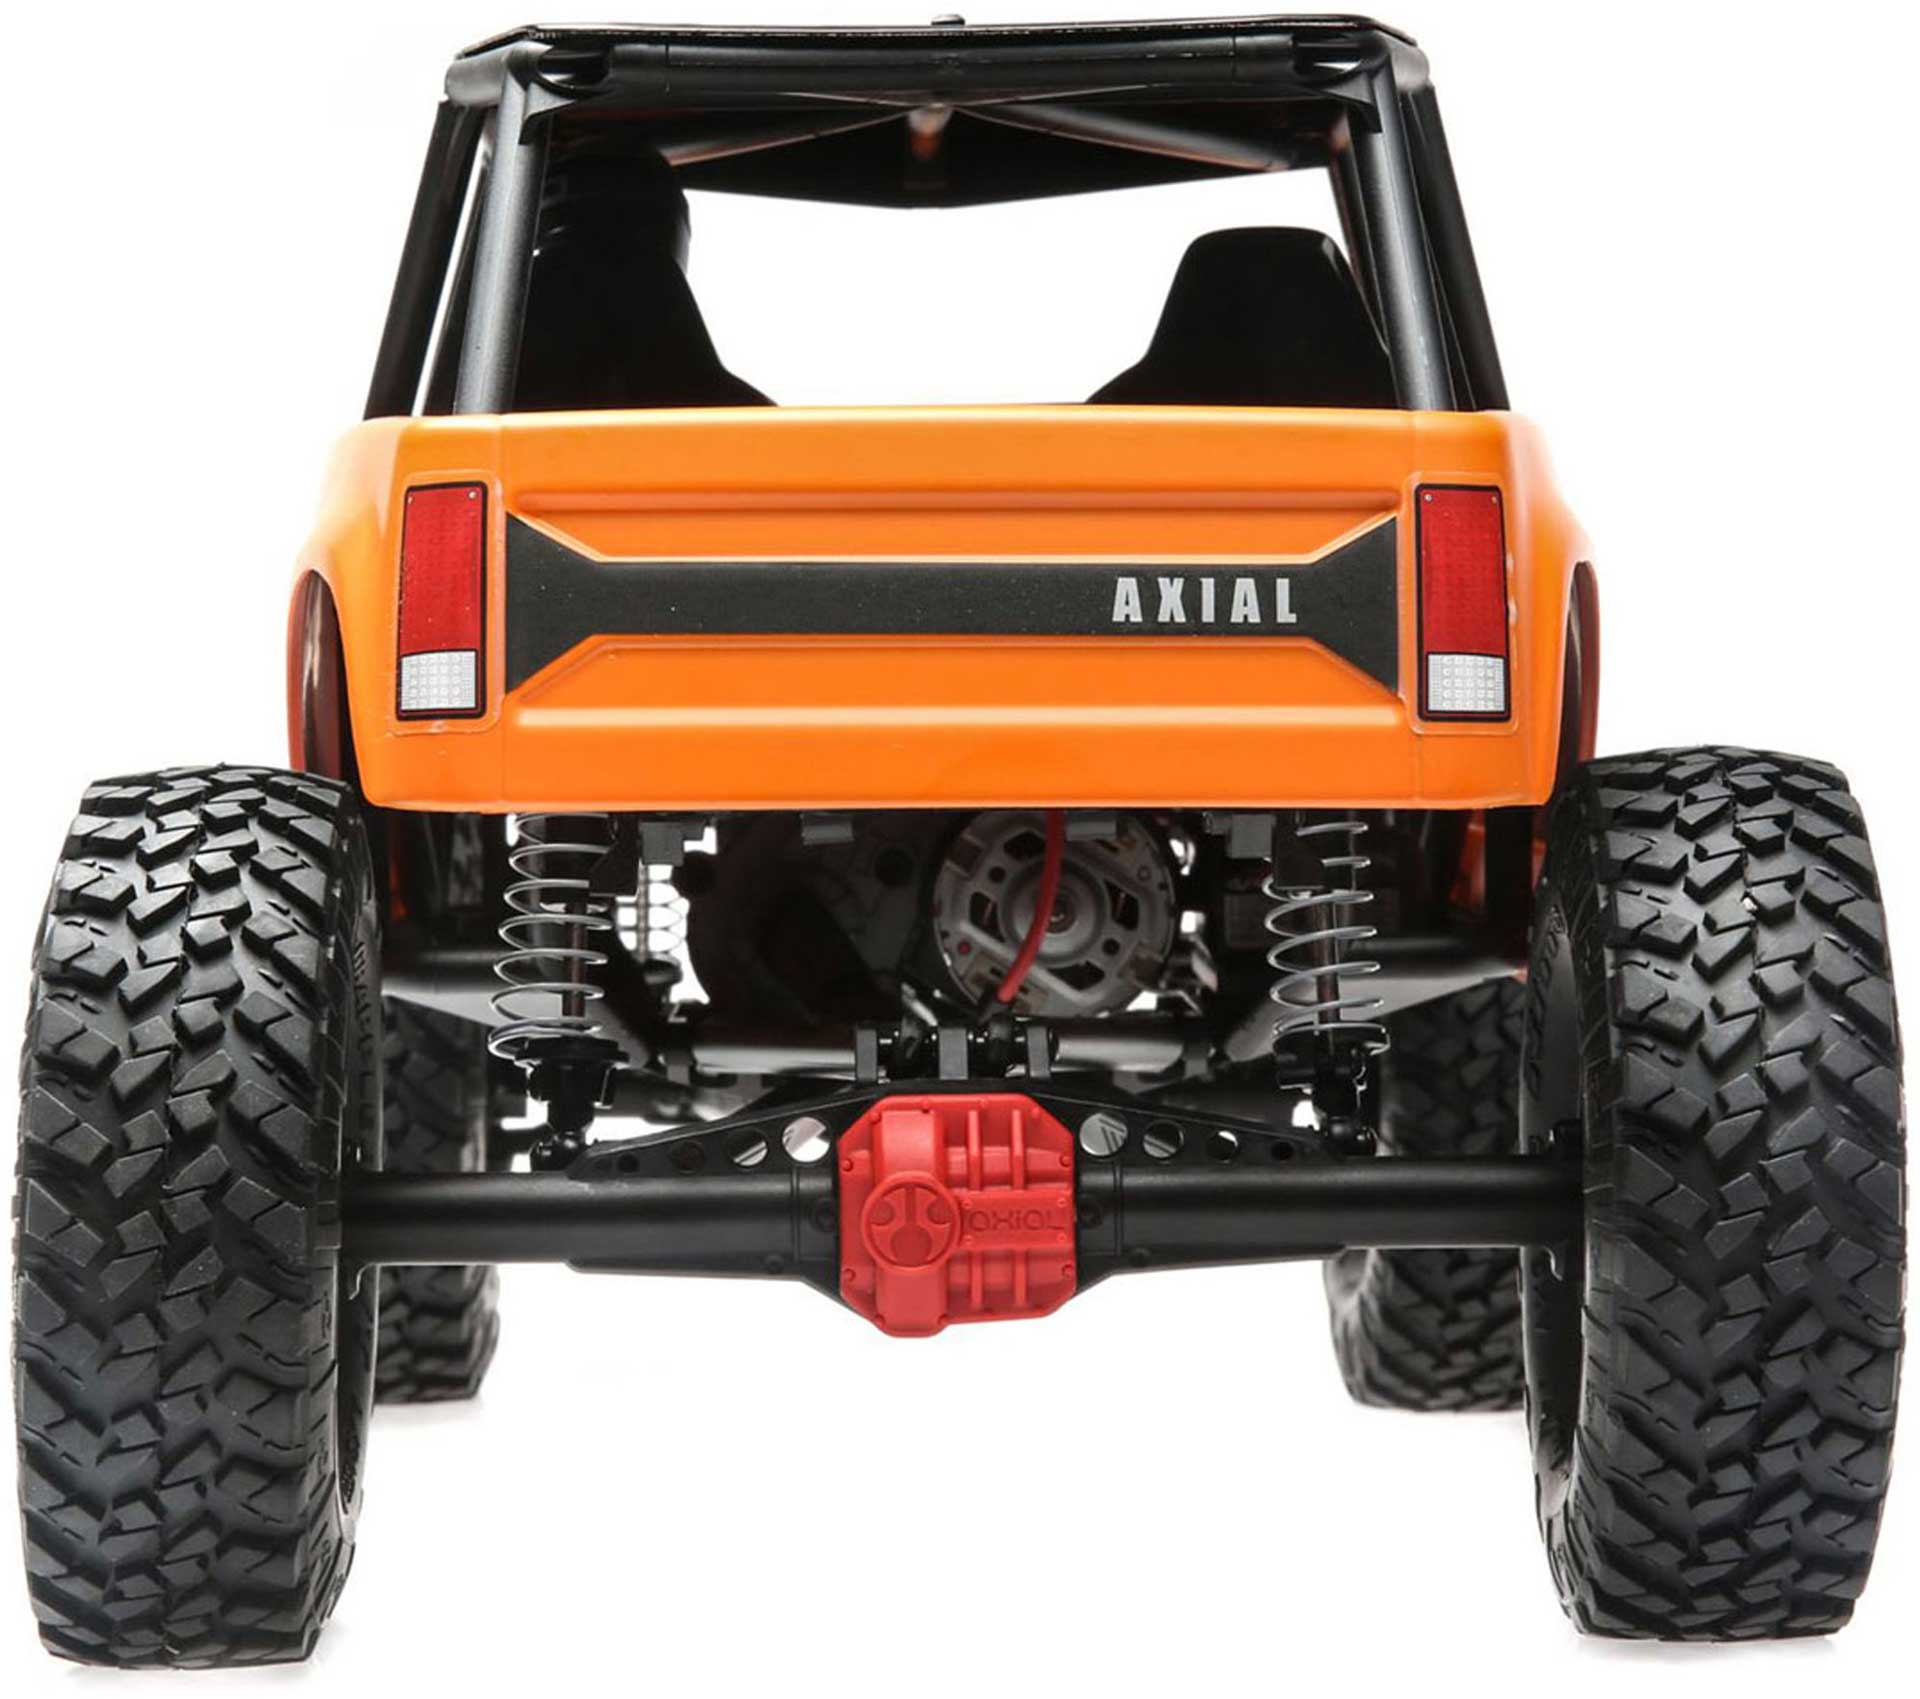 AXIAL WRAITH 1.9 4WD BRUSHED RTR, ORANGE 1/10 CRAWLER